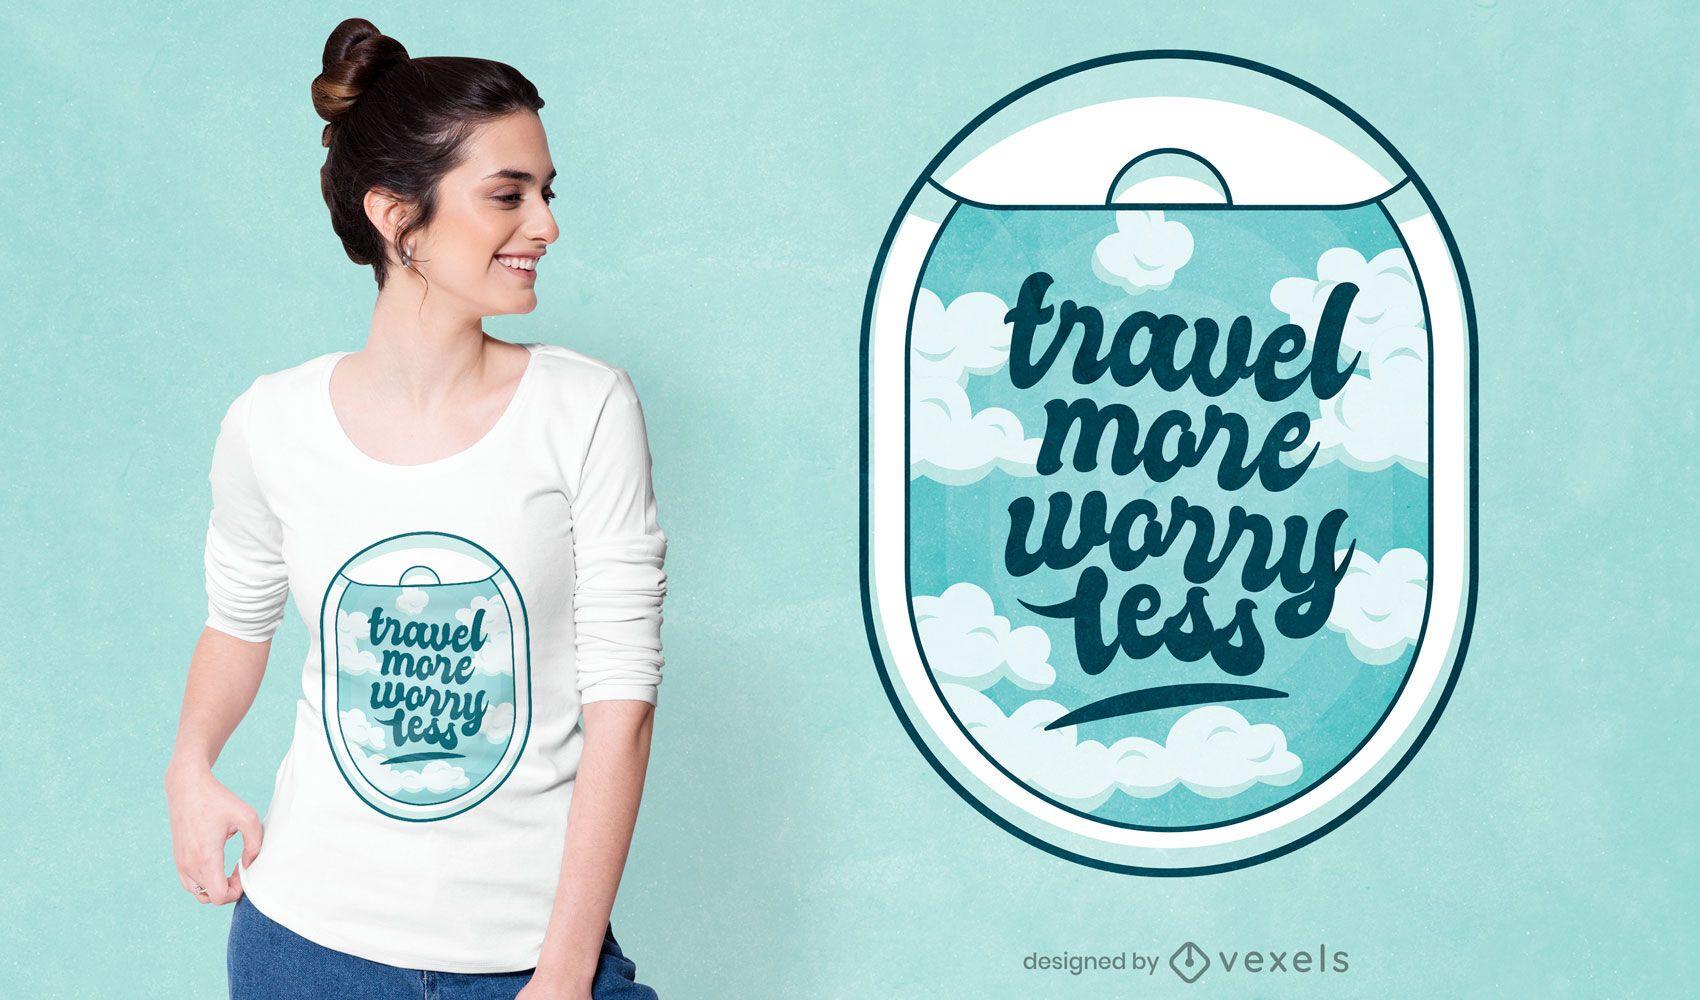 Travel quote t-shirt design